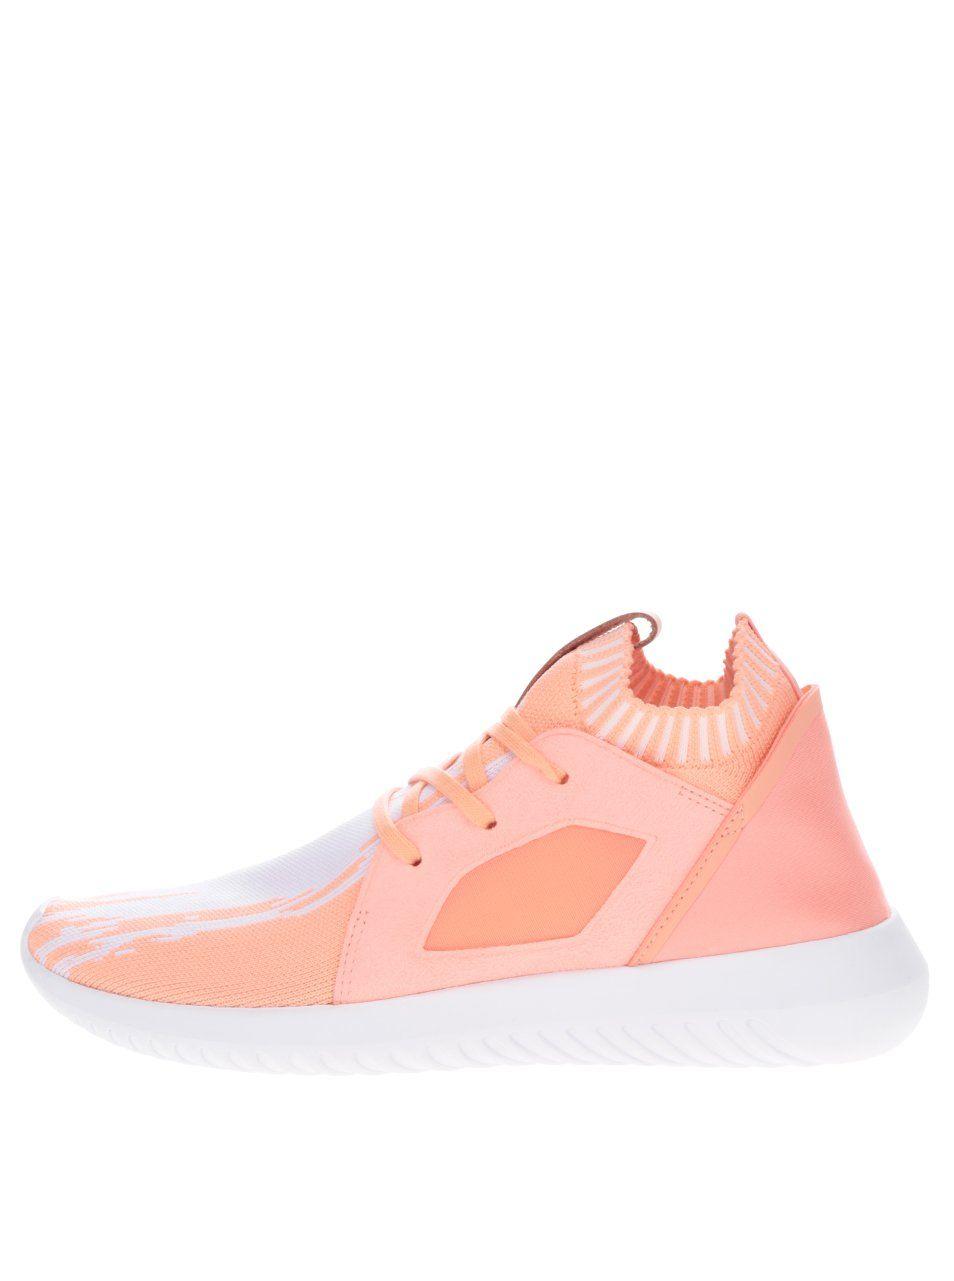 58969f726ff2 Oranžové dámské tenisky adidas Originals Tubular Defiantpk 3499 Kč ...